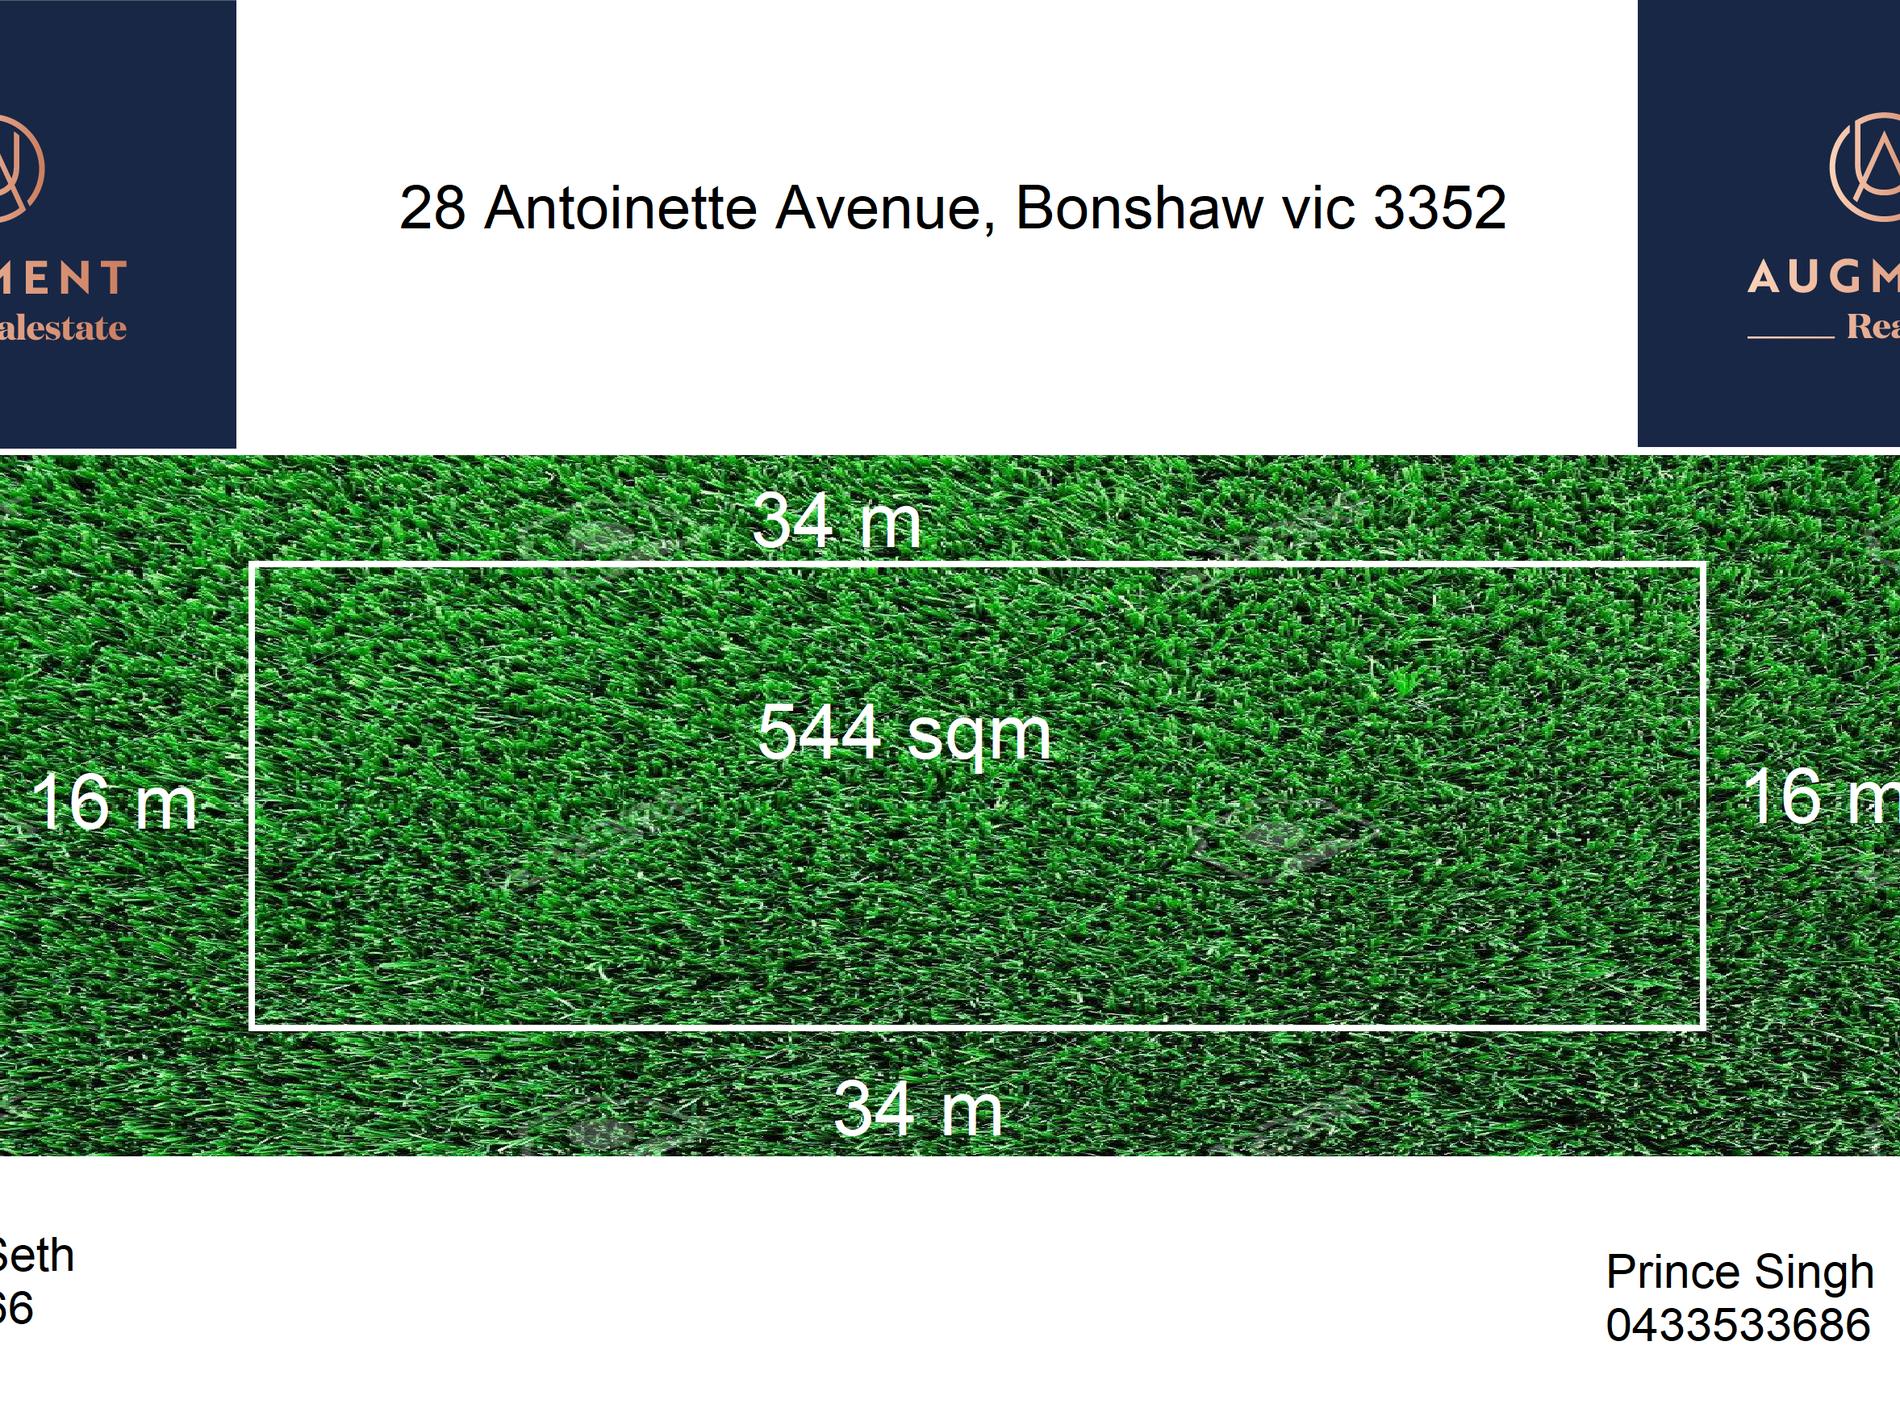 28 Antoinette Avenue, Bonshaw